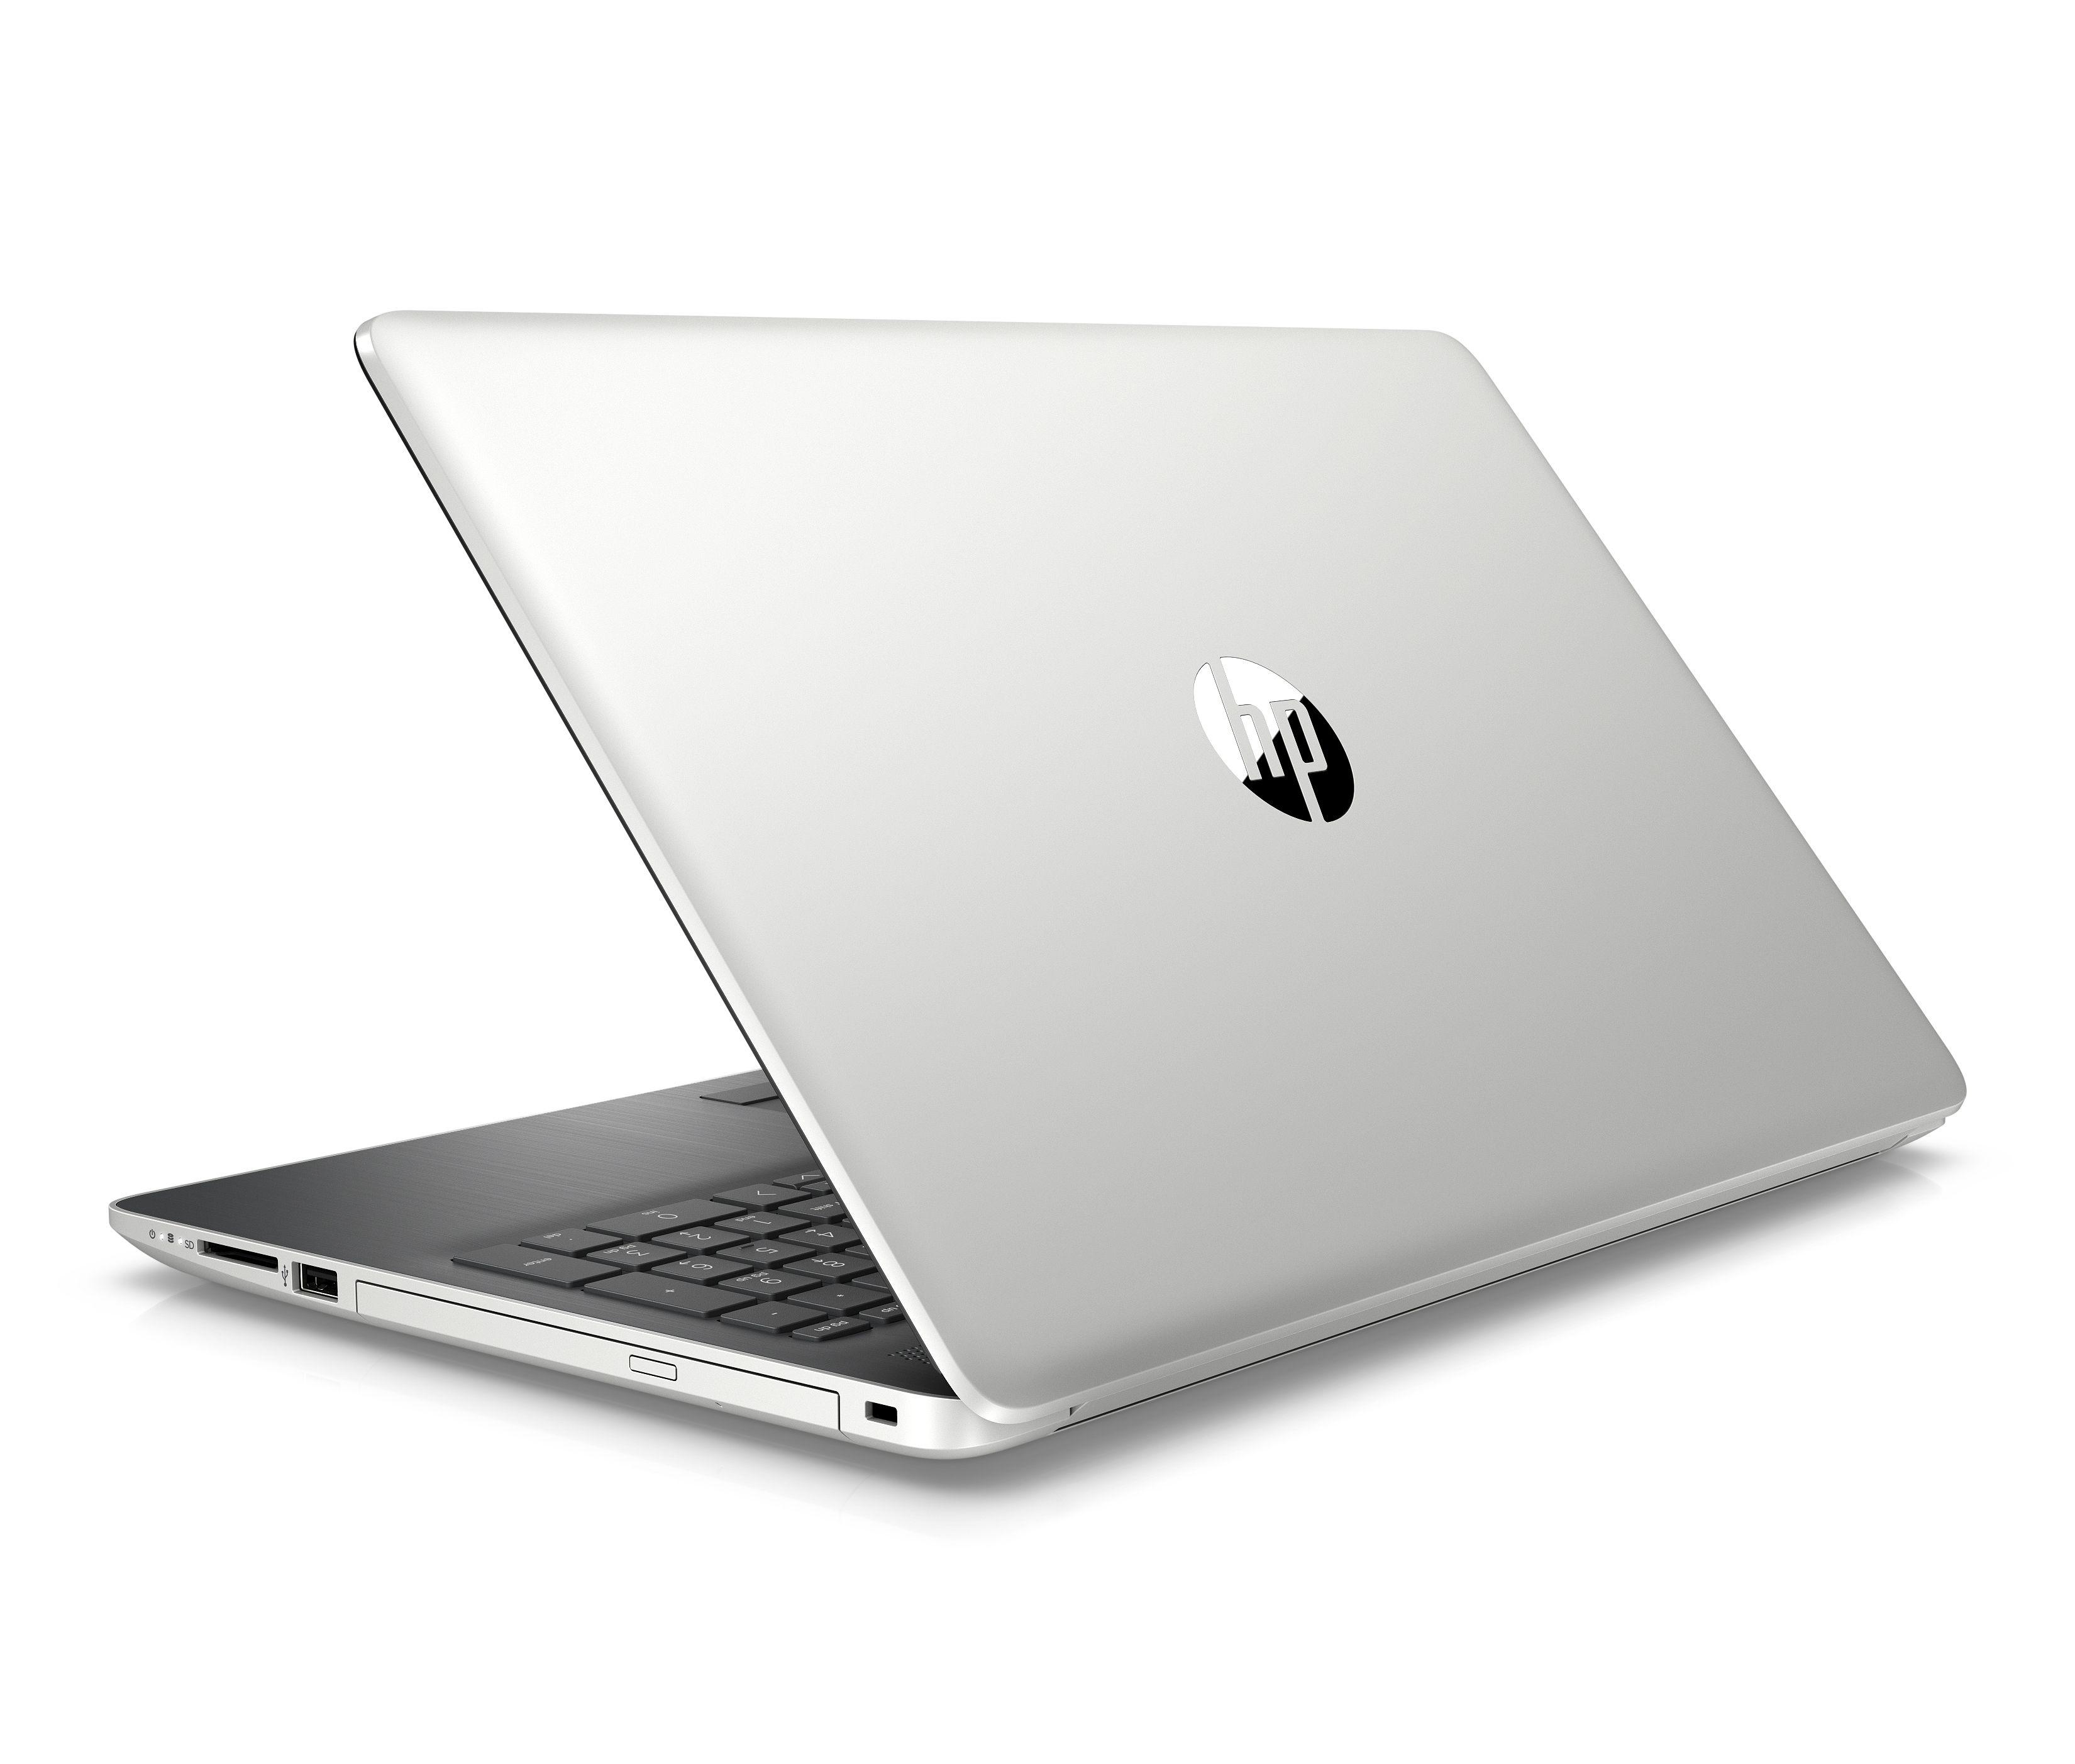 Hp 15 Graphite Mist Laptop Touchscreen Intel Core I5 8250u 1tb Hdd 16gb Intel Optane Memory 4gb Sdram Dvd 15 Da0053wm Walmart Com Hp Pavilion Laptop Laptop Computers Laptop